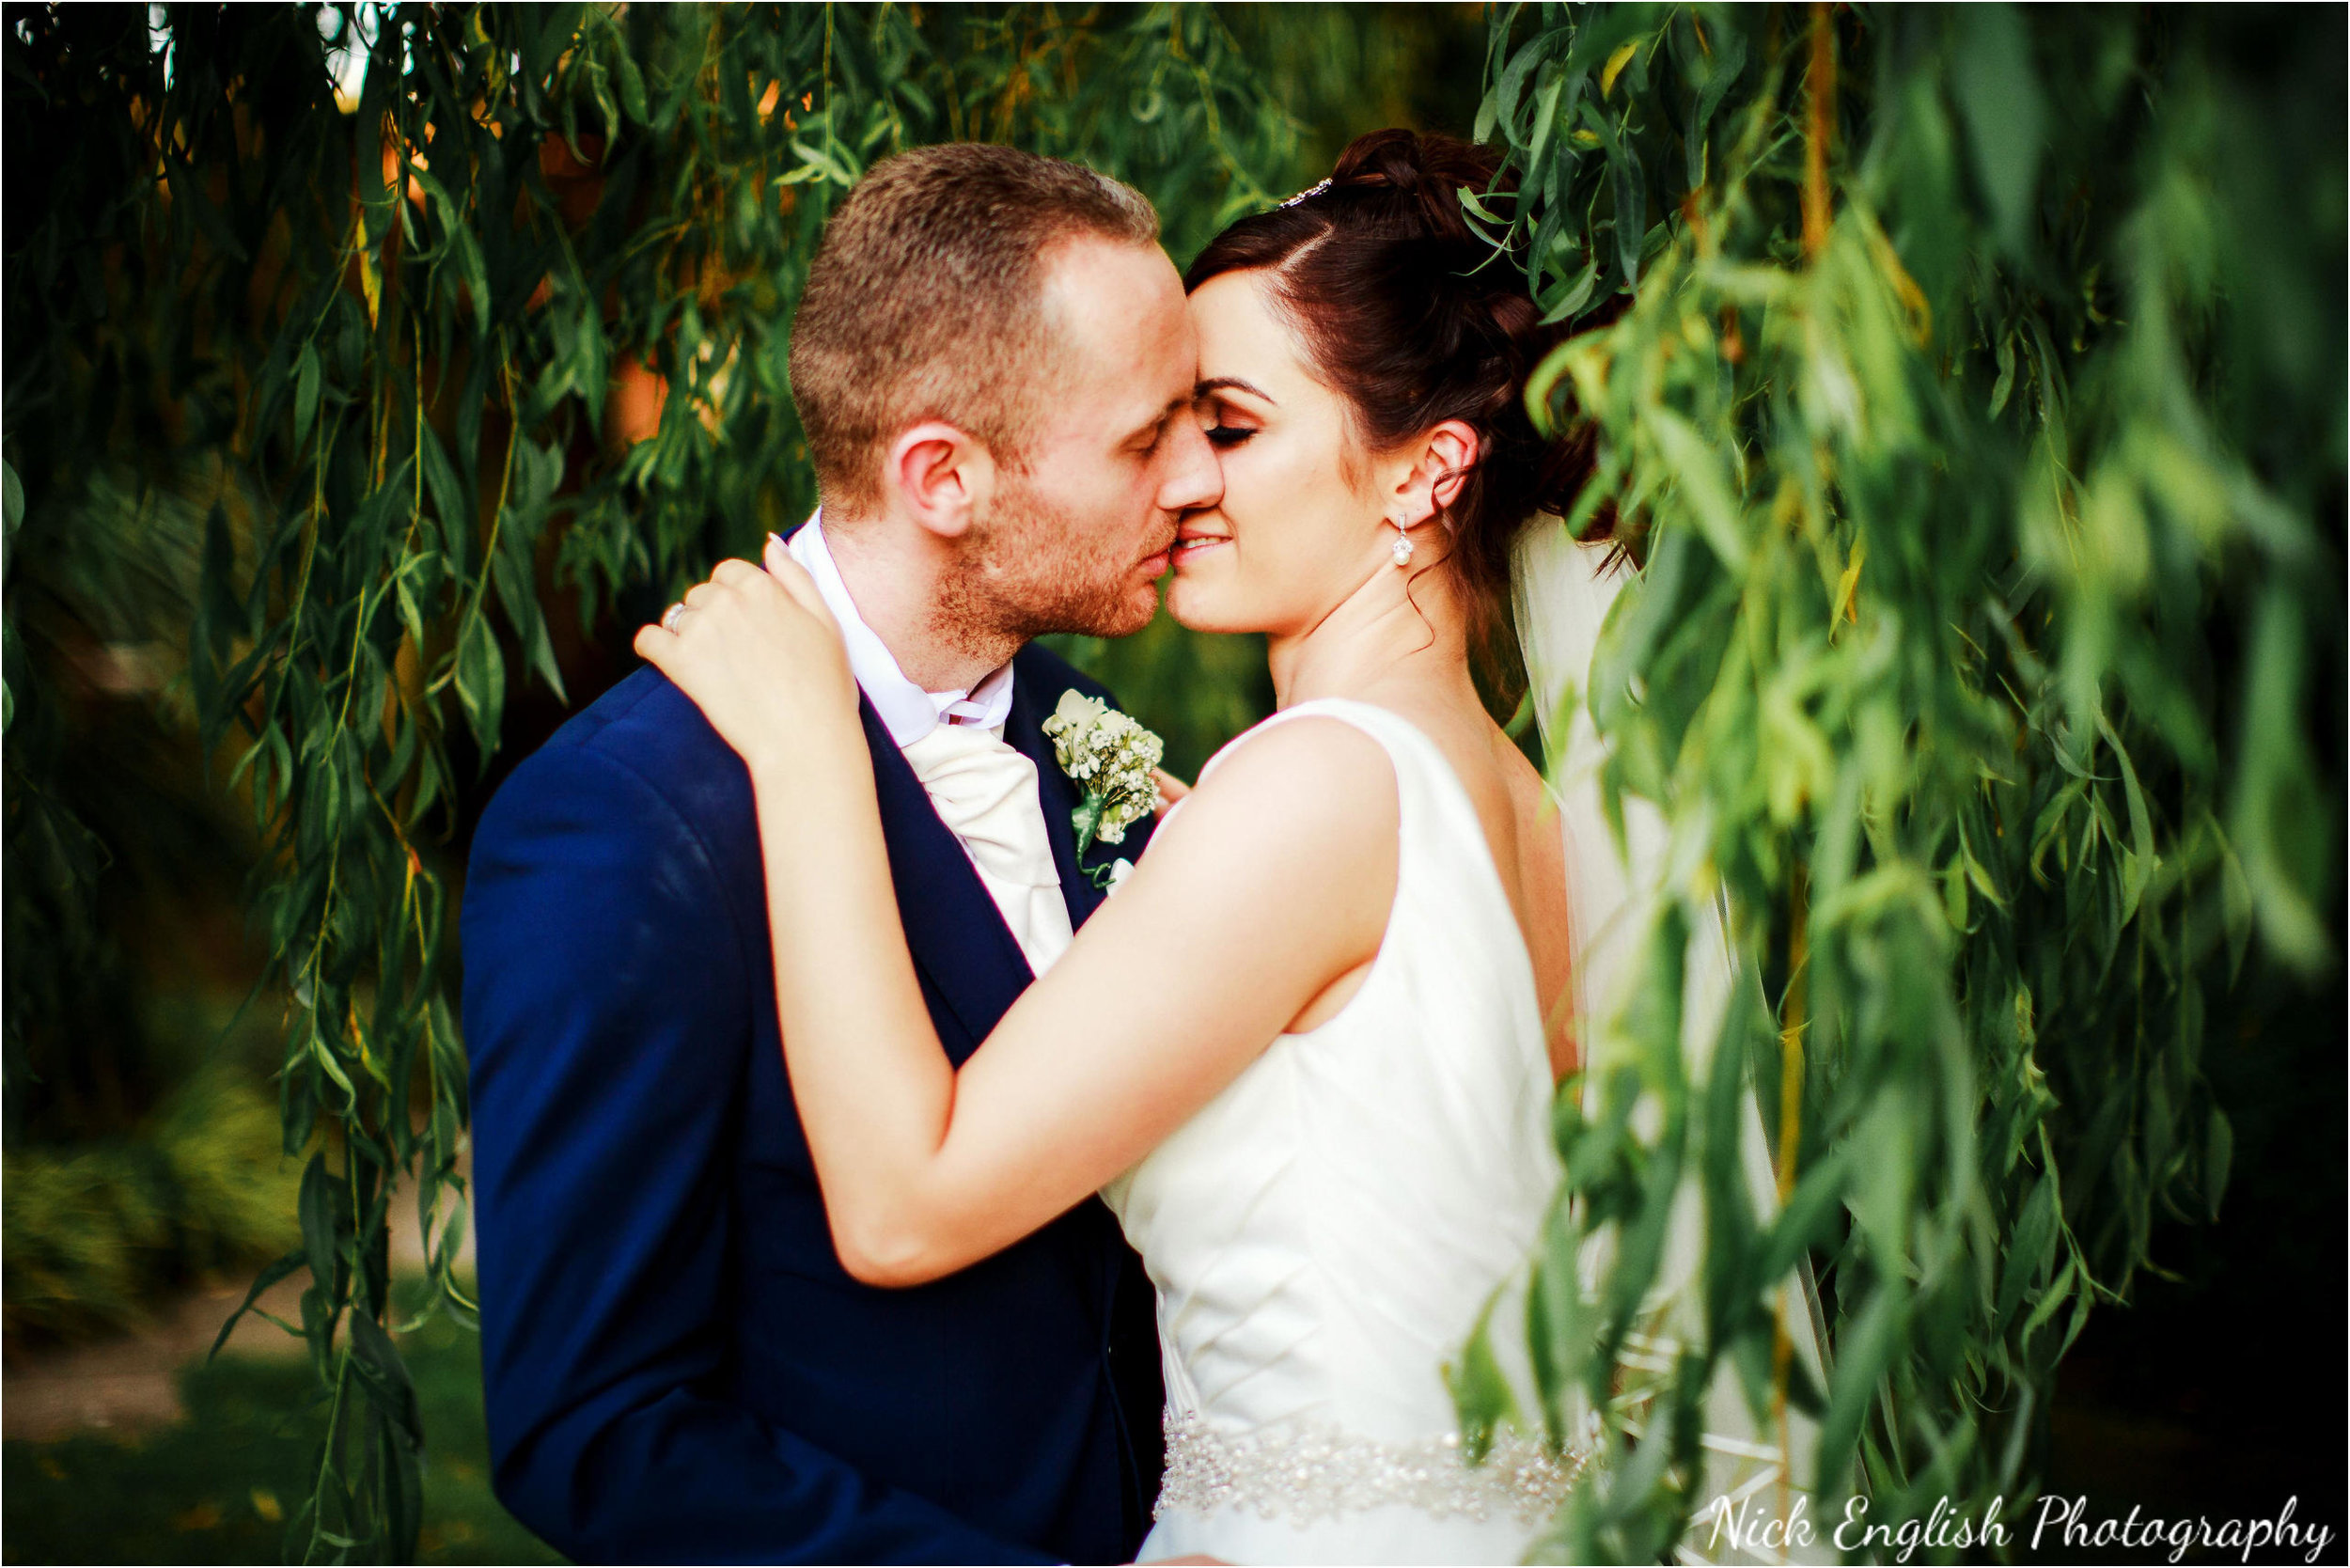 Emily David Wedding Photographs at Barton Grange Preston by Nick English Photography 203jpg.jpeg